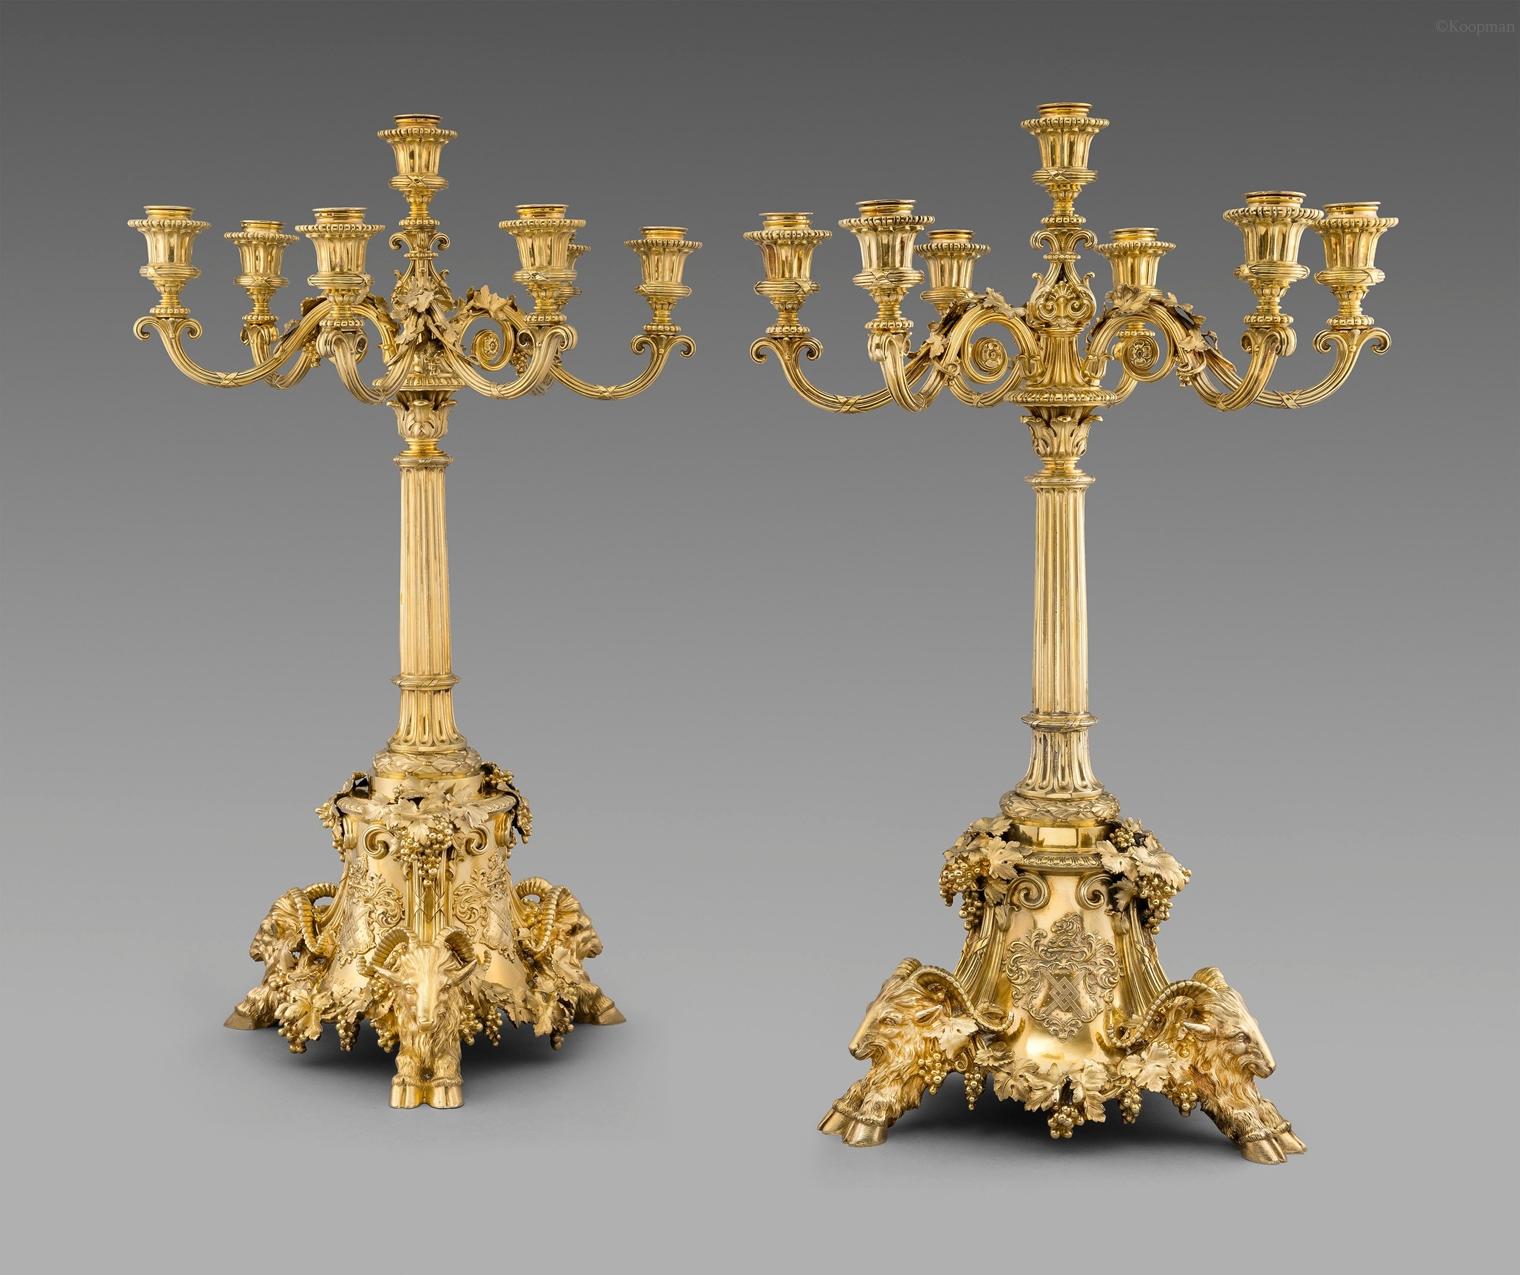 A Pair of Victorian Seven-Light Candelabra